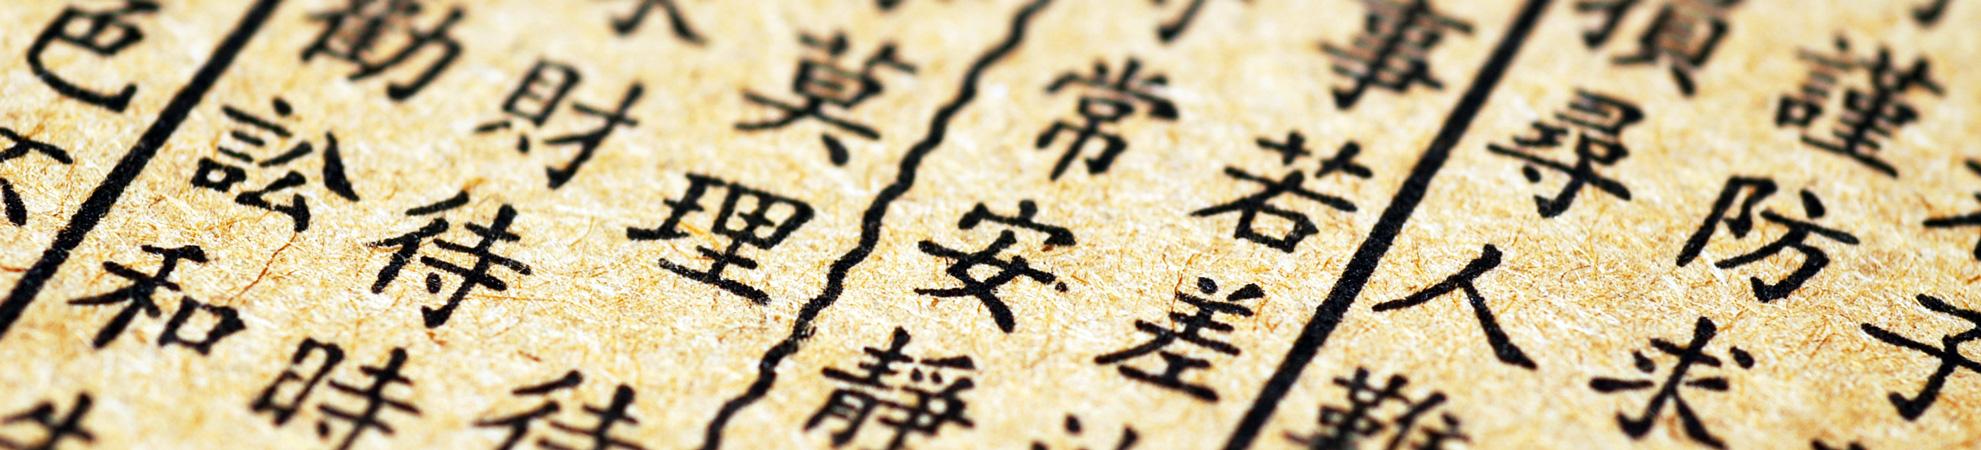 Langues en Chine